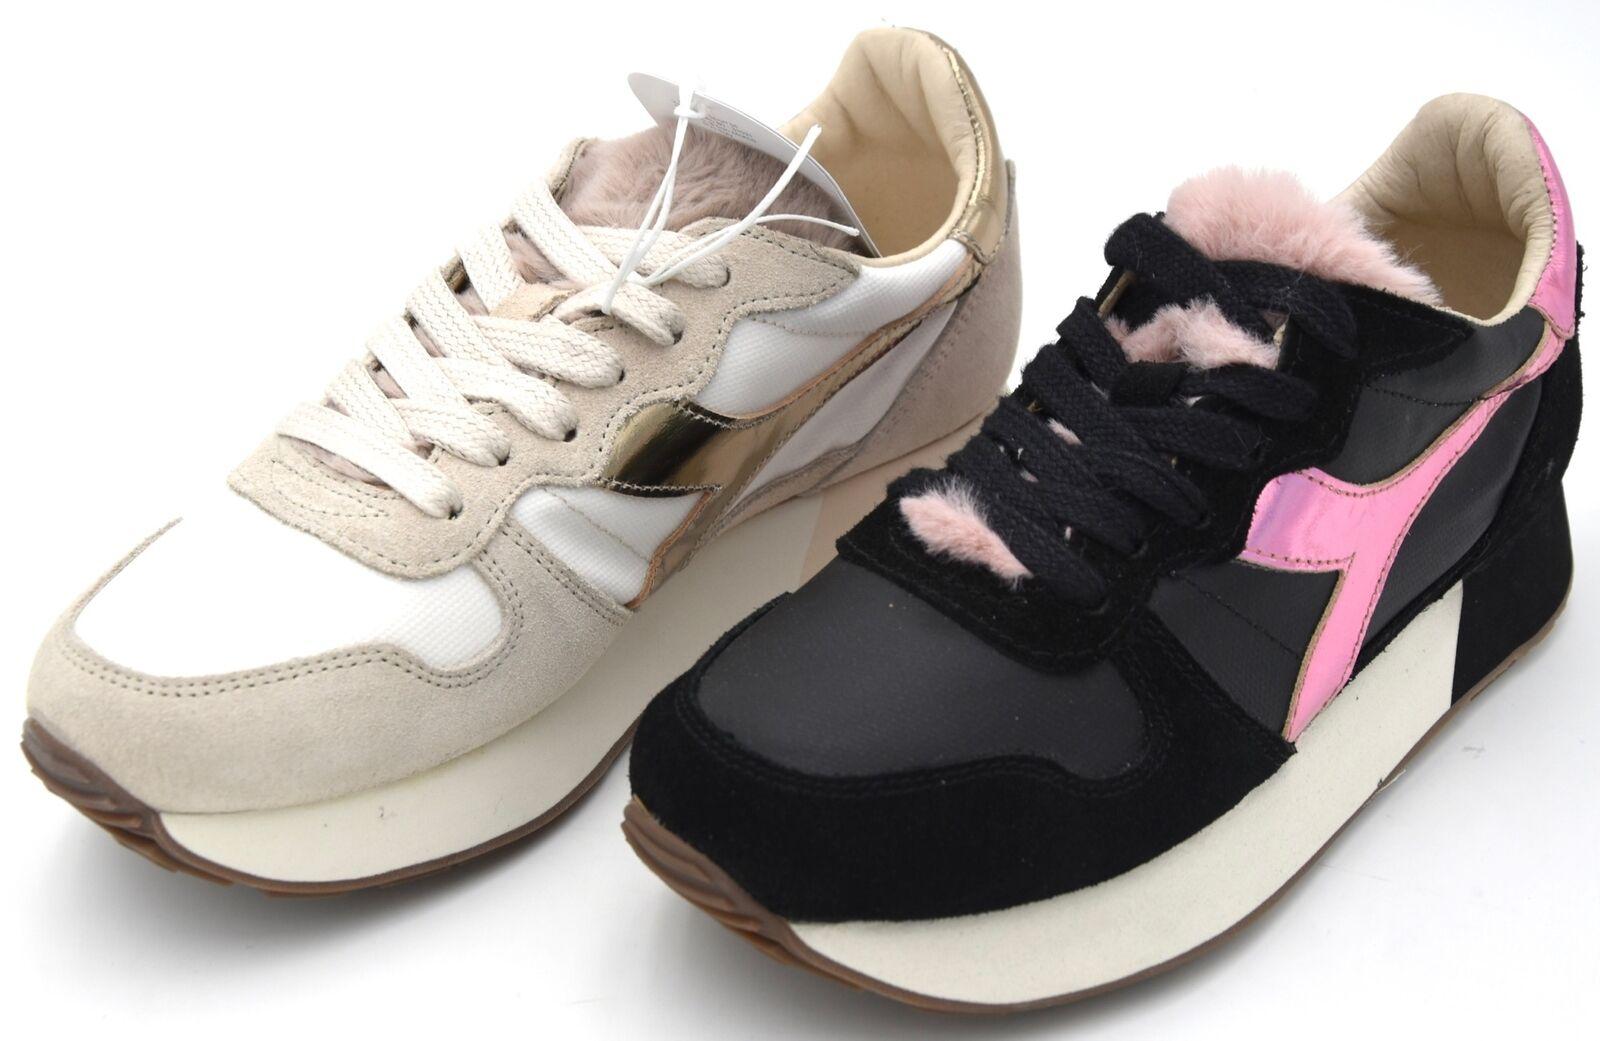 Diadora Heritage Womens Sneakers Casual shoes Trainer Type. Camaro H W Fur